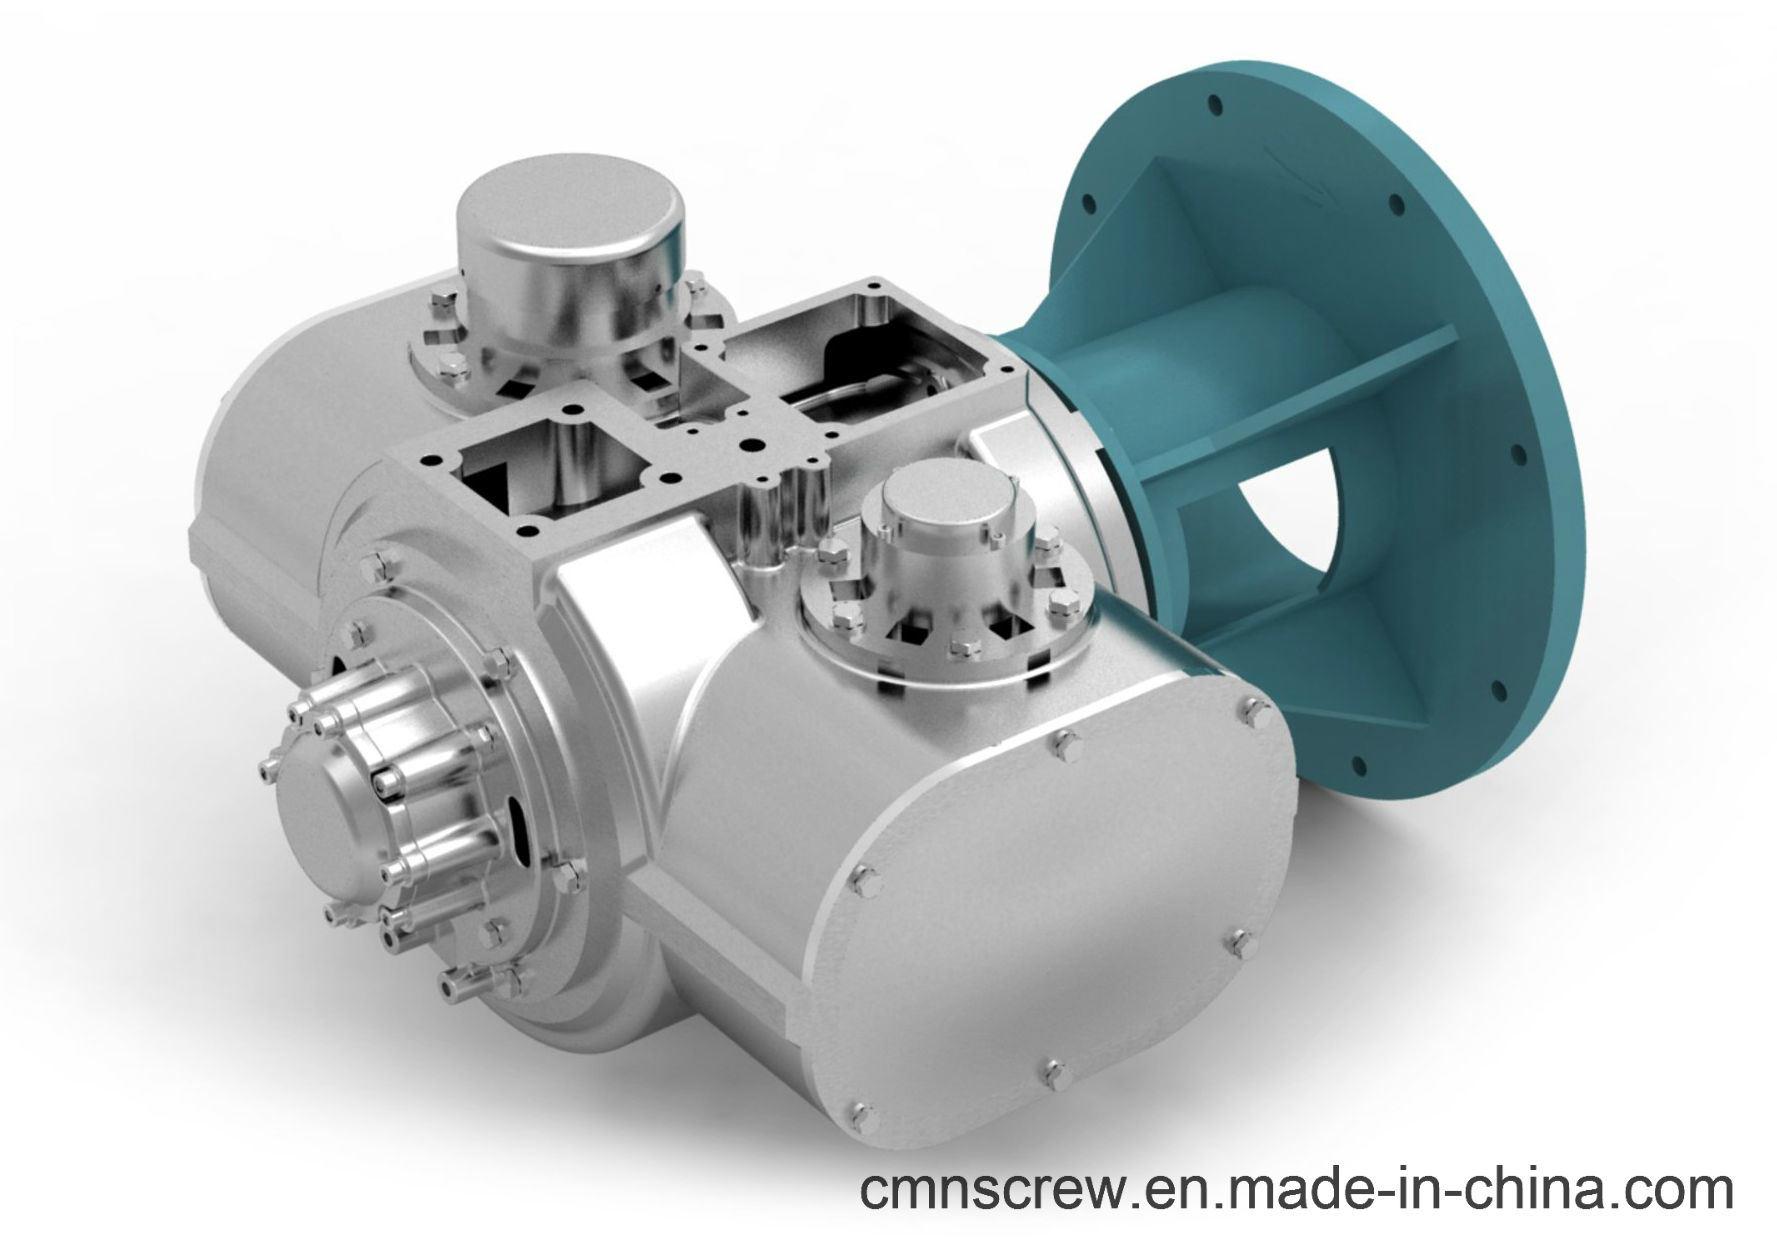 Oil Free Screw Air Compressor (CM 90BV)